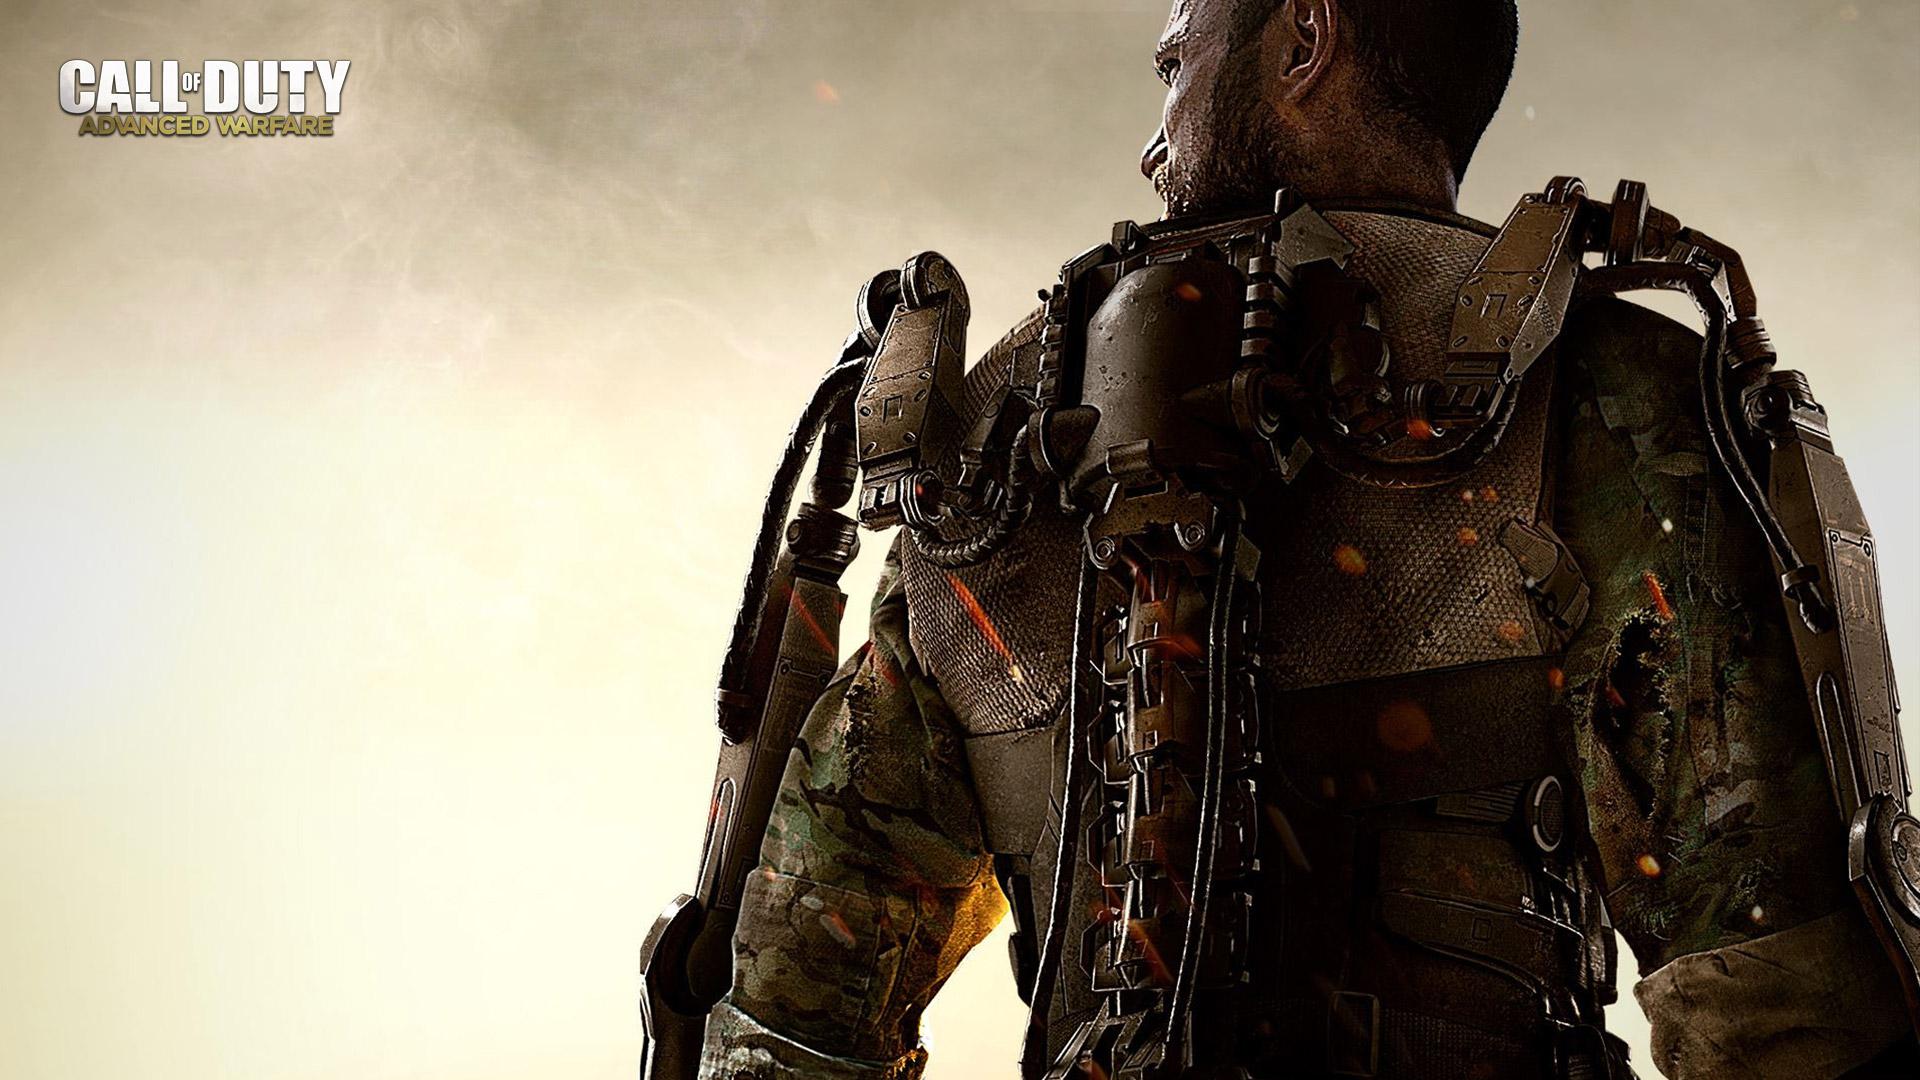 Call of Duty Advanced Warfare wallpaper 9